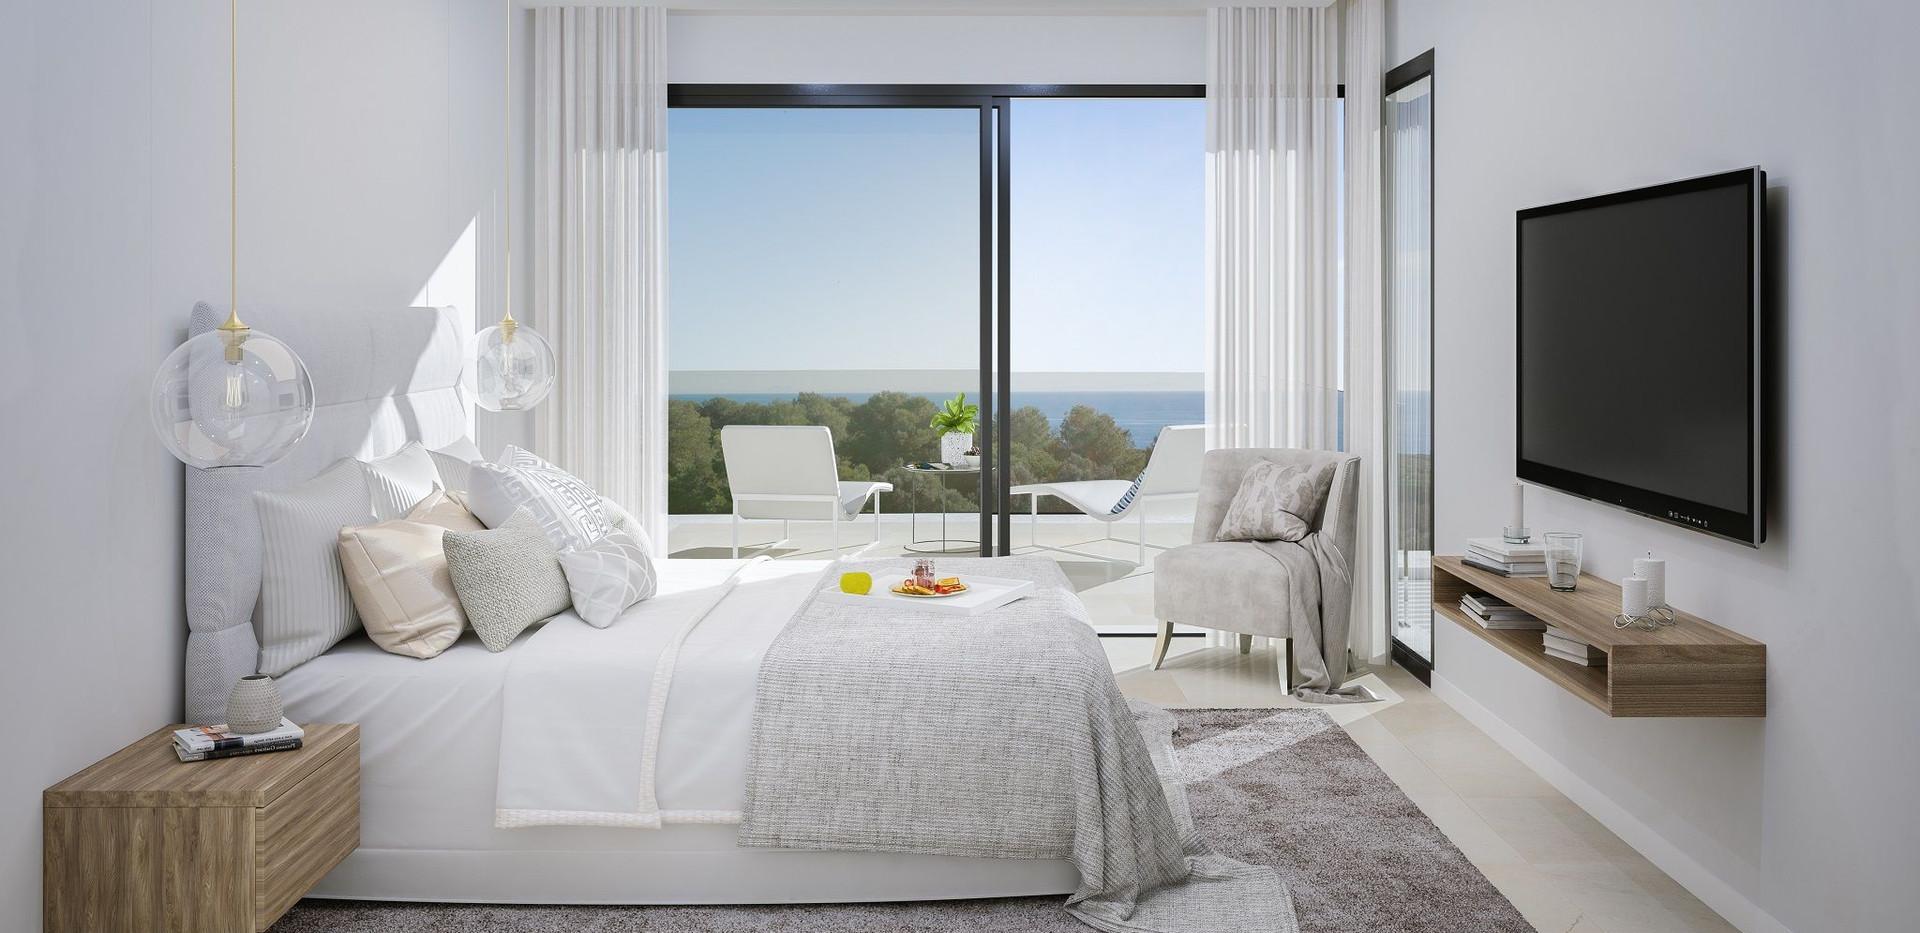 CaboRoyale-Bedroom-Type-B-1.jpg